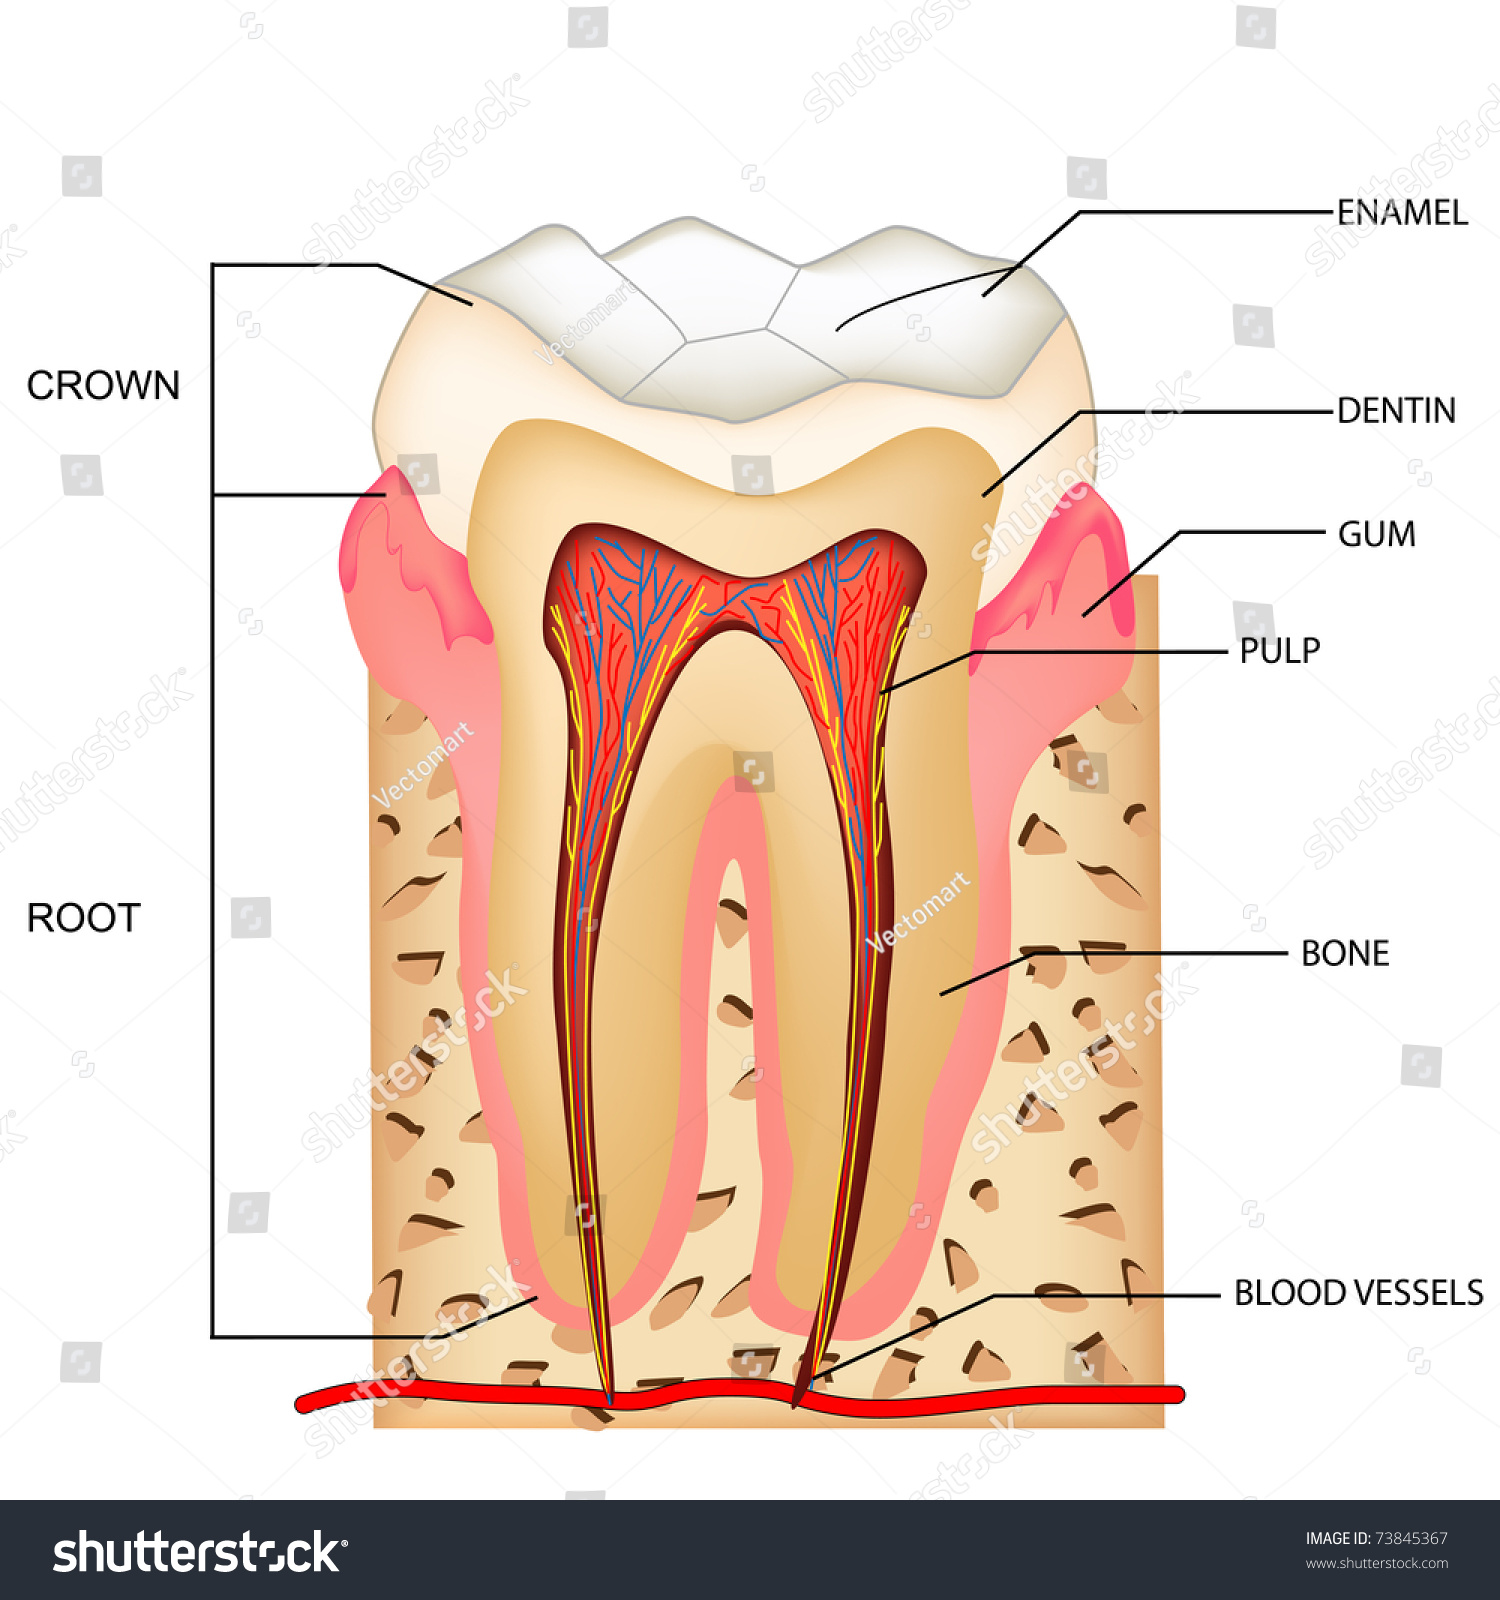 Illustration Anatomy Teeth Labeling Stock Vector 2018 73845367